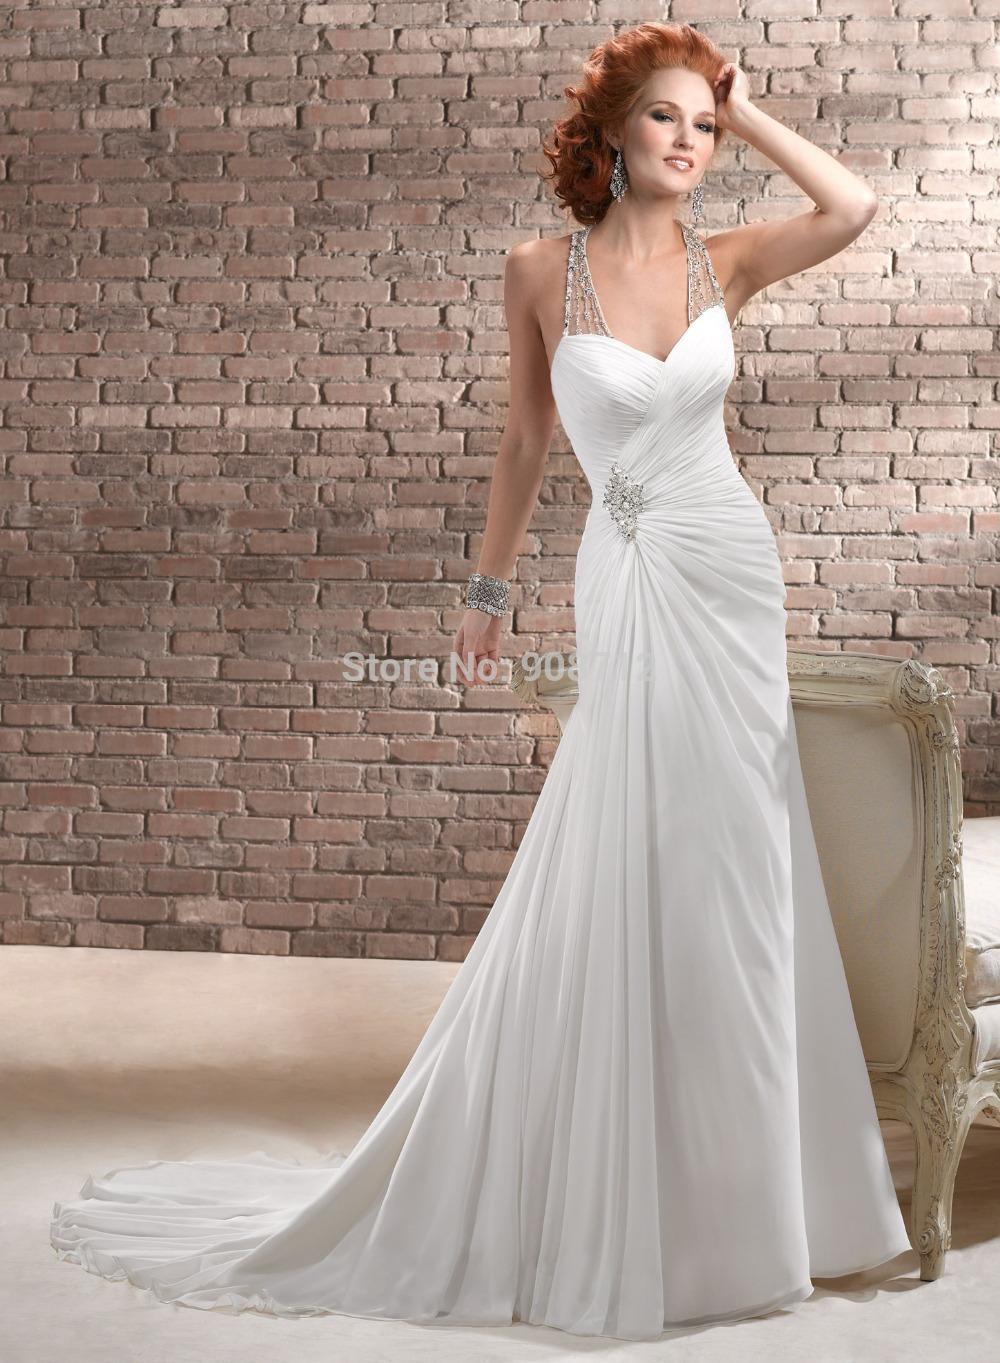 Bridesmaid Dresses Fushia Archives - Page 87 of 473 - Overlay ...